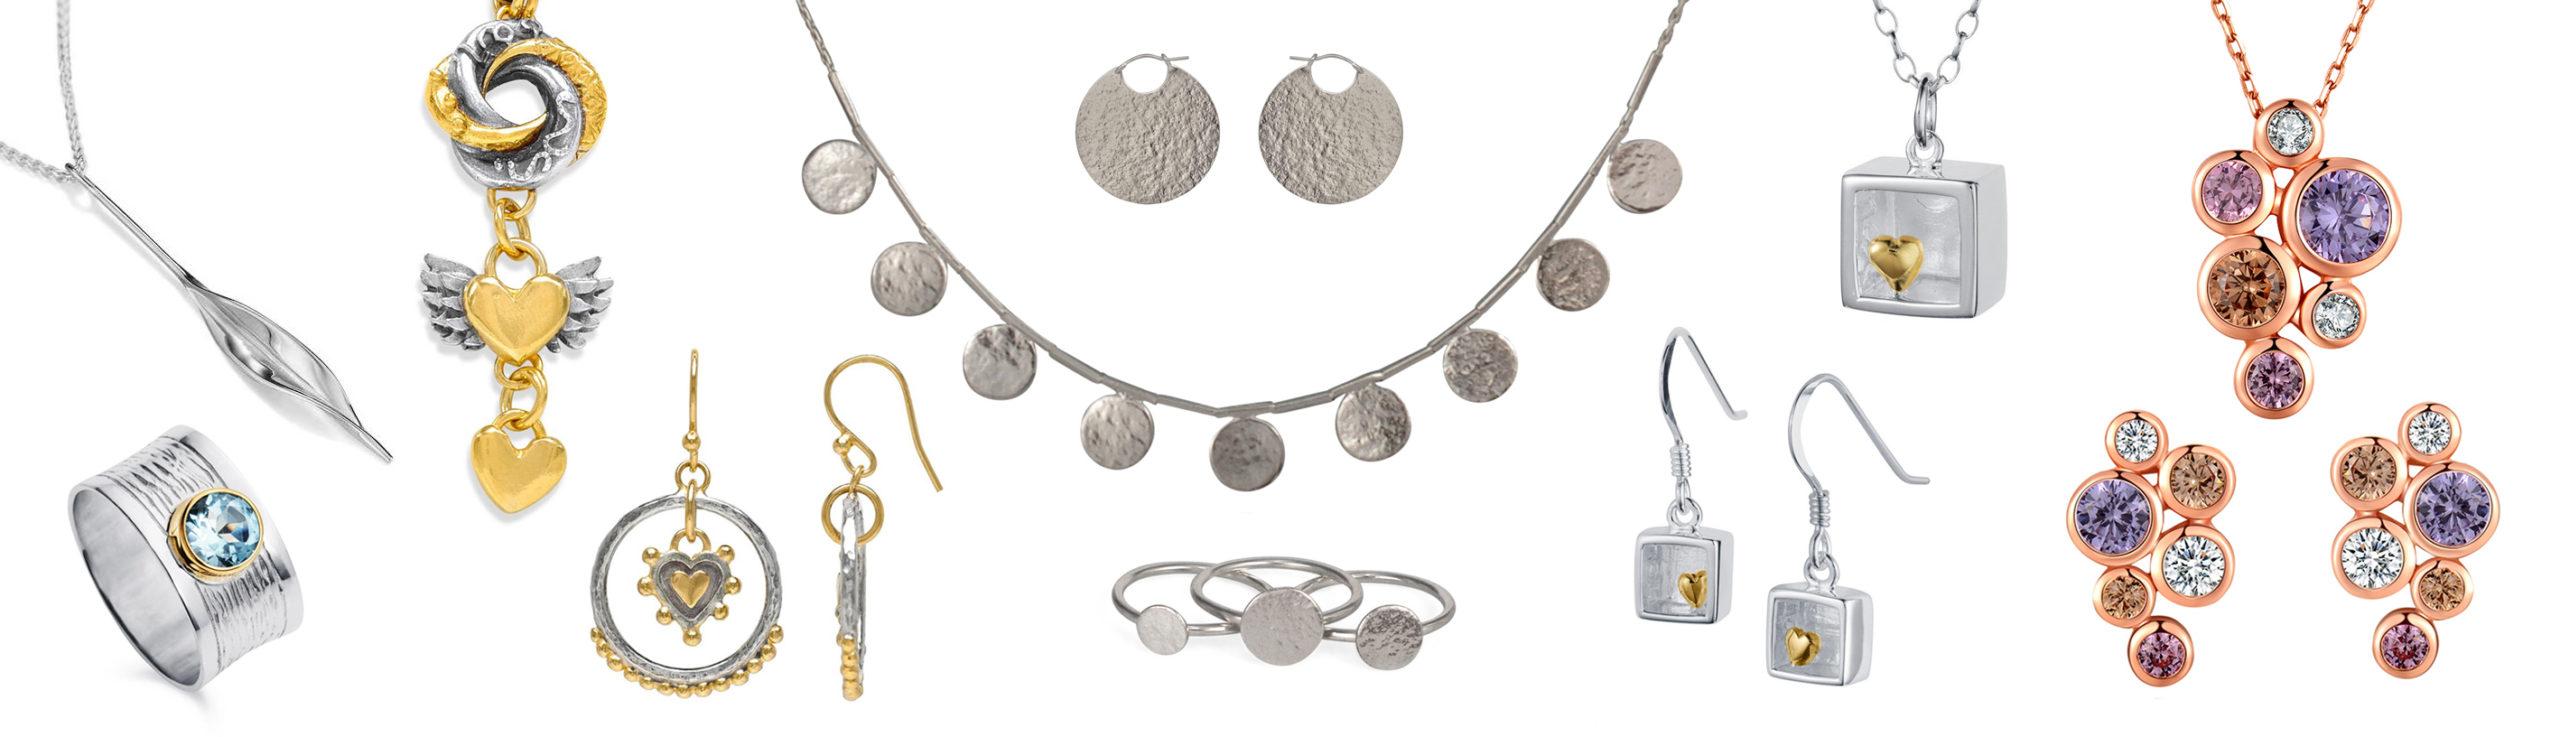 Louise Shafar Jewellery Shop